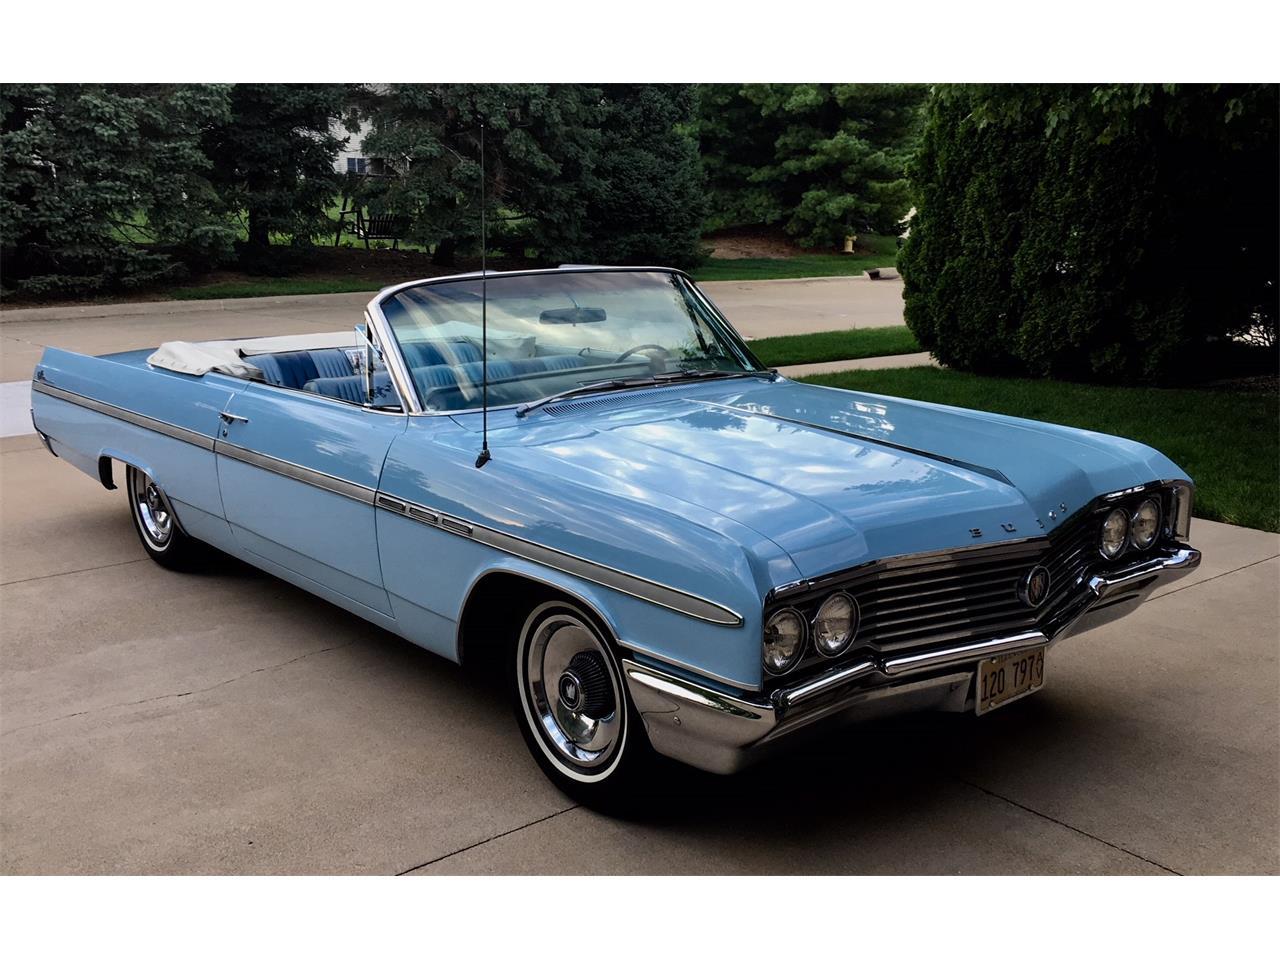 1960 Buick LeSabre Hardtop